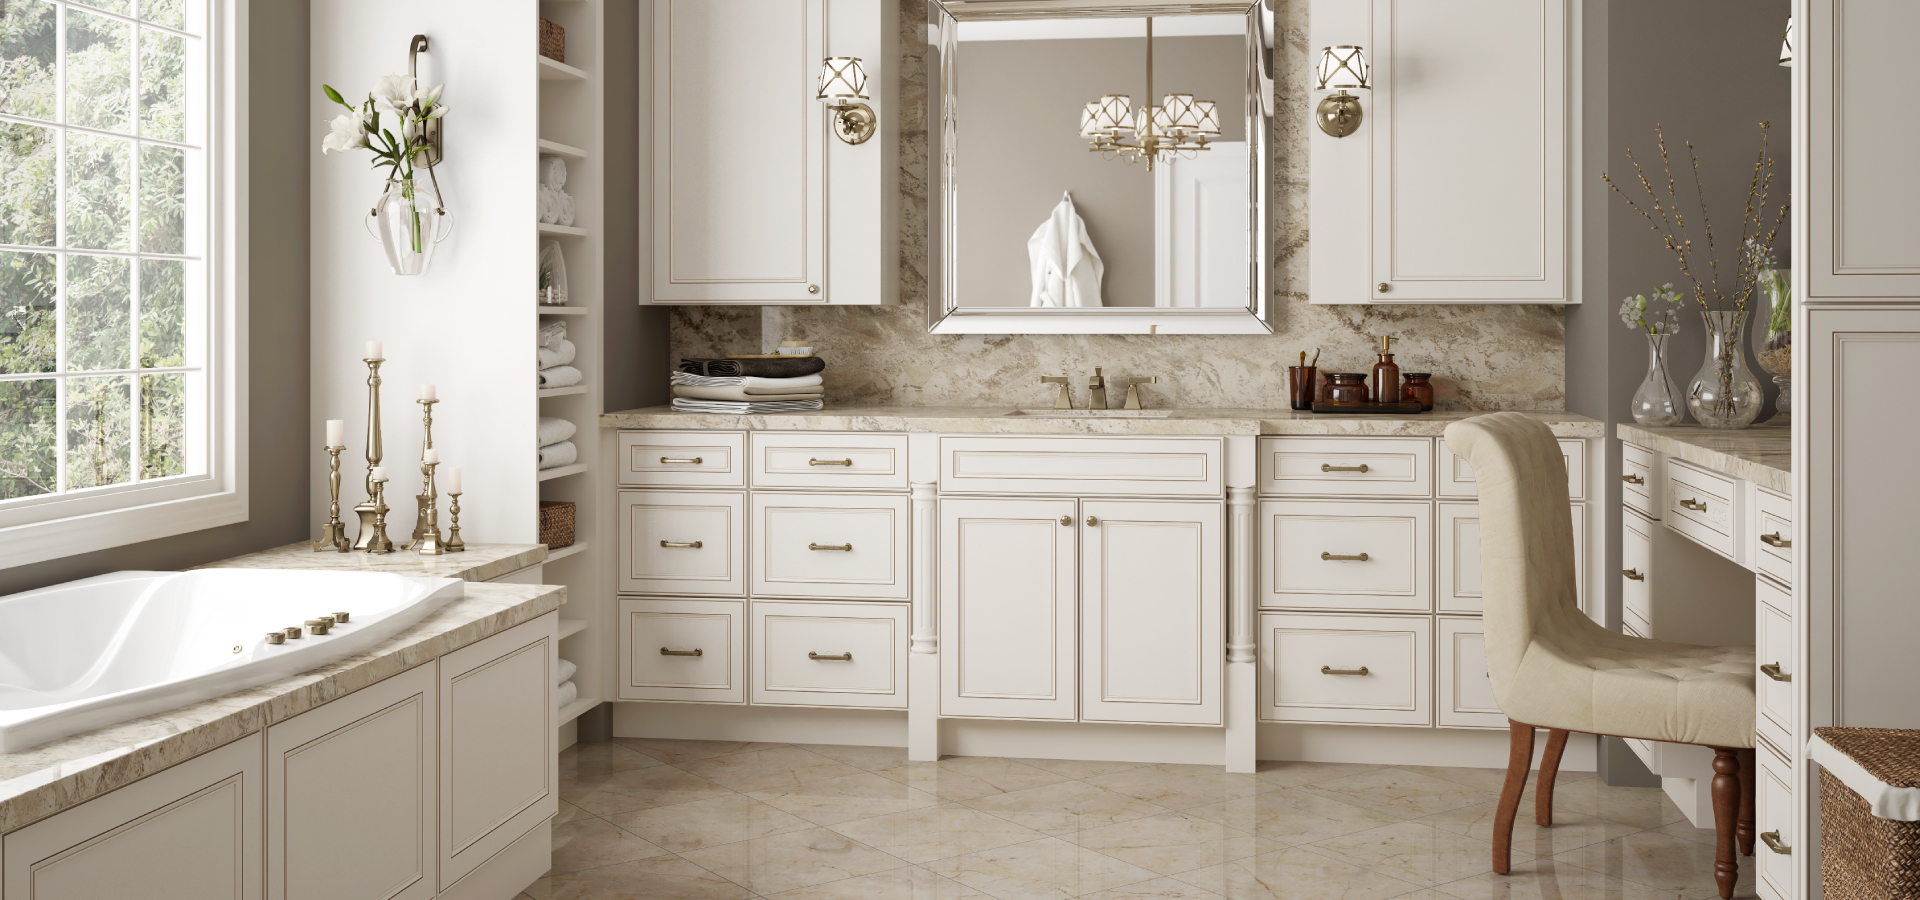 bath cabinets bathroom cabinets KHMNSAU